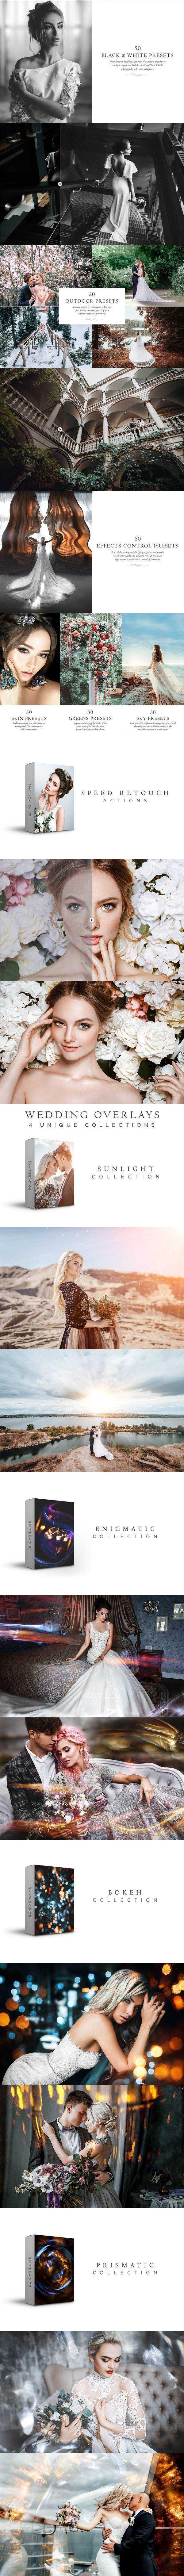 1806033 1250+ Wedding Bundle LR & PS items 2476990 2